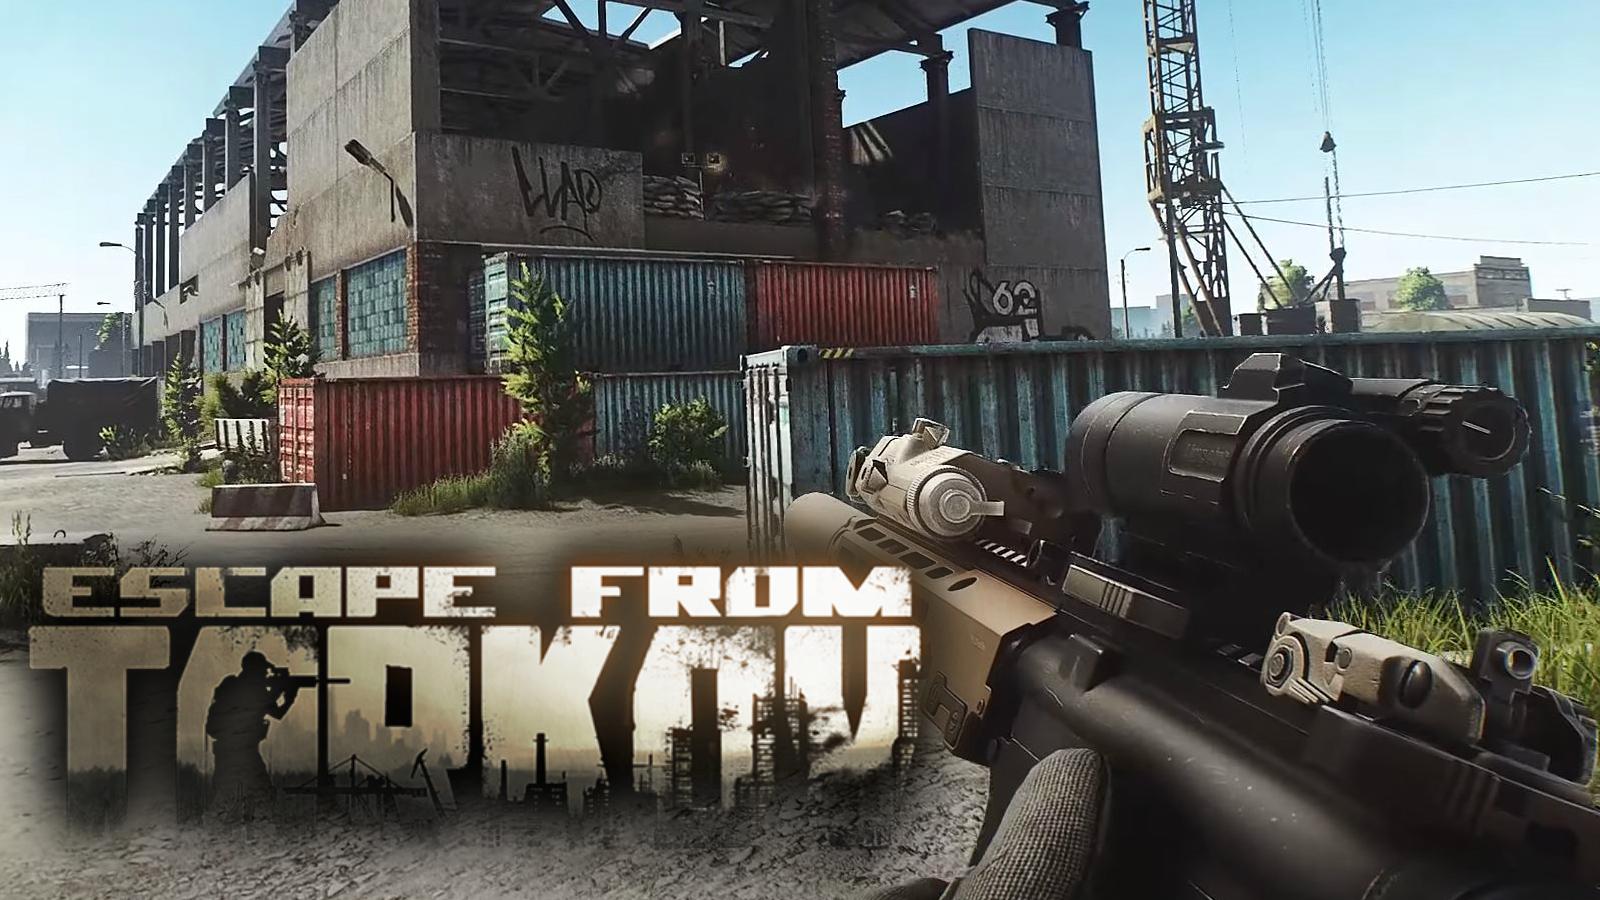 Escape from Tarkov gun and logo